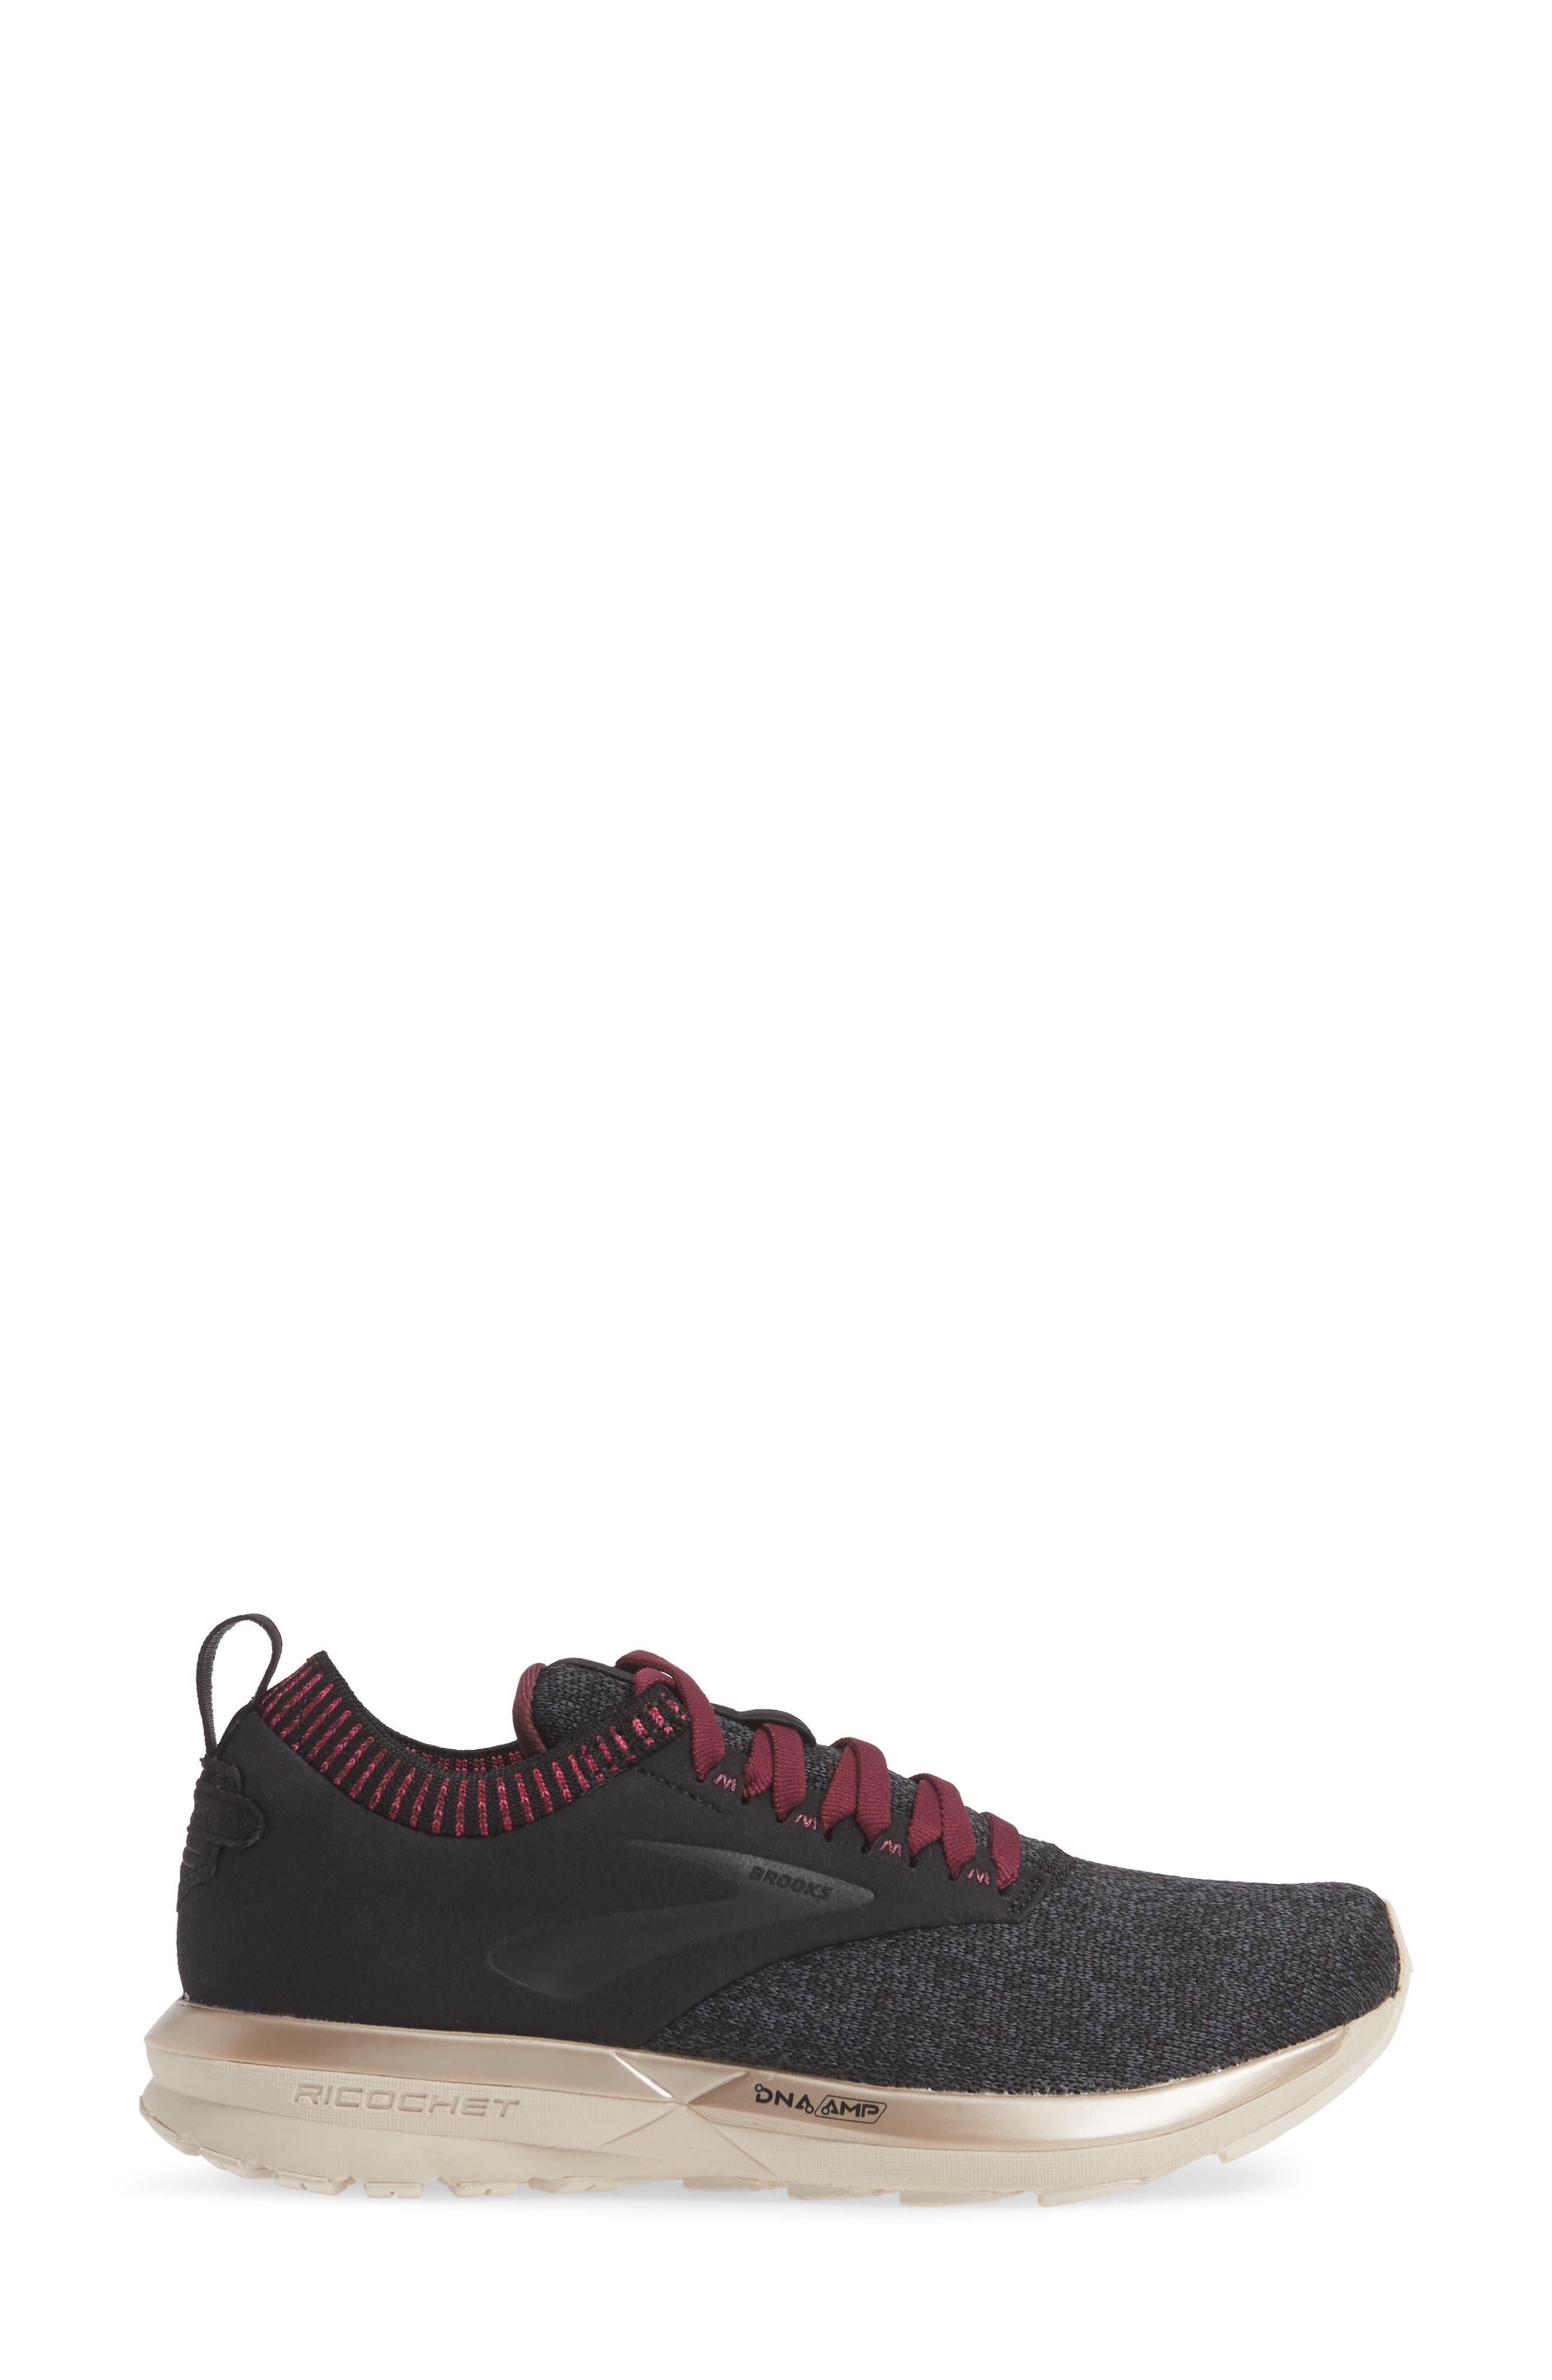 ,                             Ricochet LE Running Shoe,                             Alternate thumbnail 3, color,                             BLACK/ GREY/ PINK